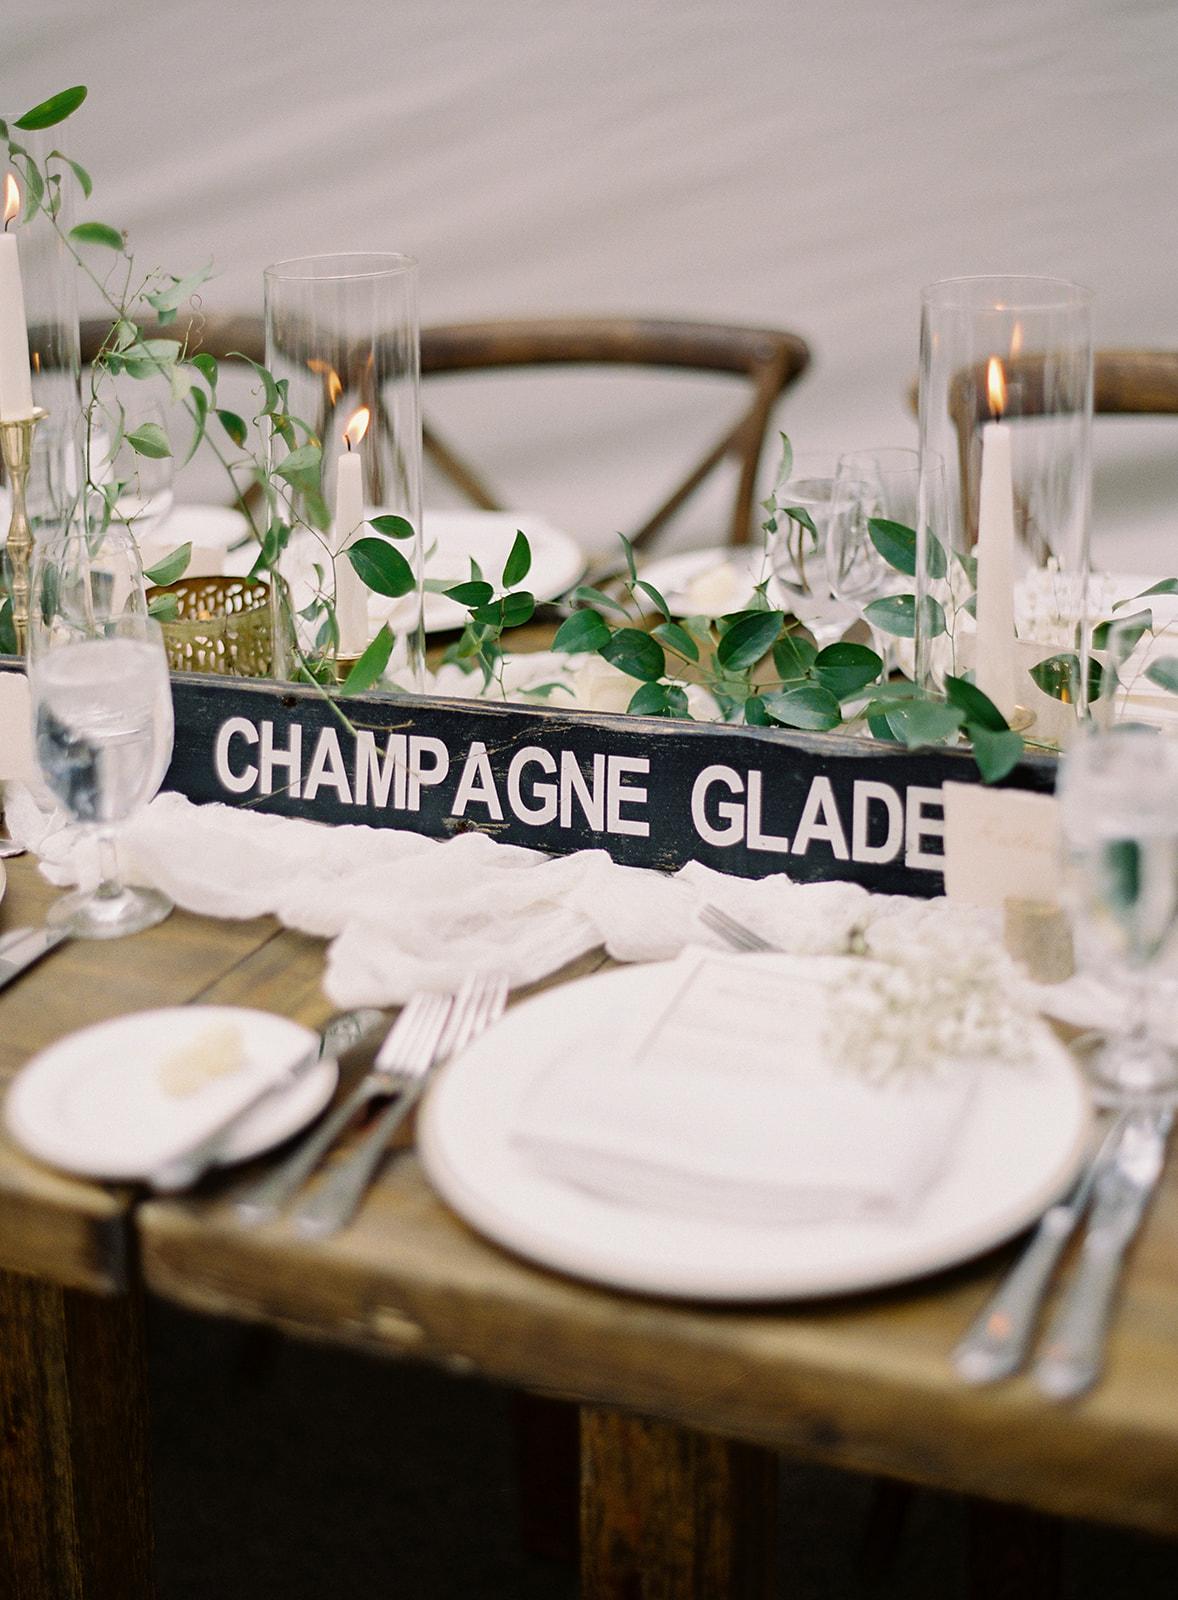 creative name ski signs reception tables